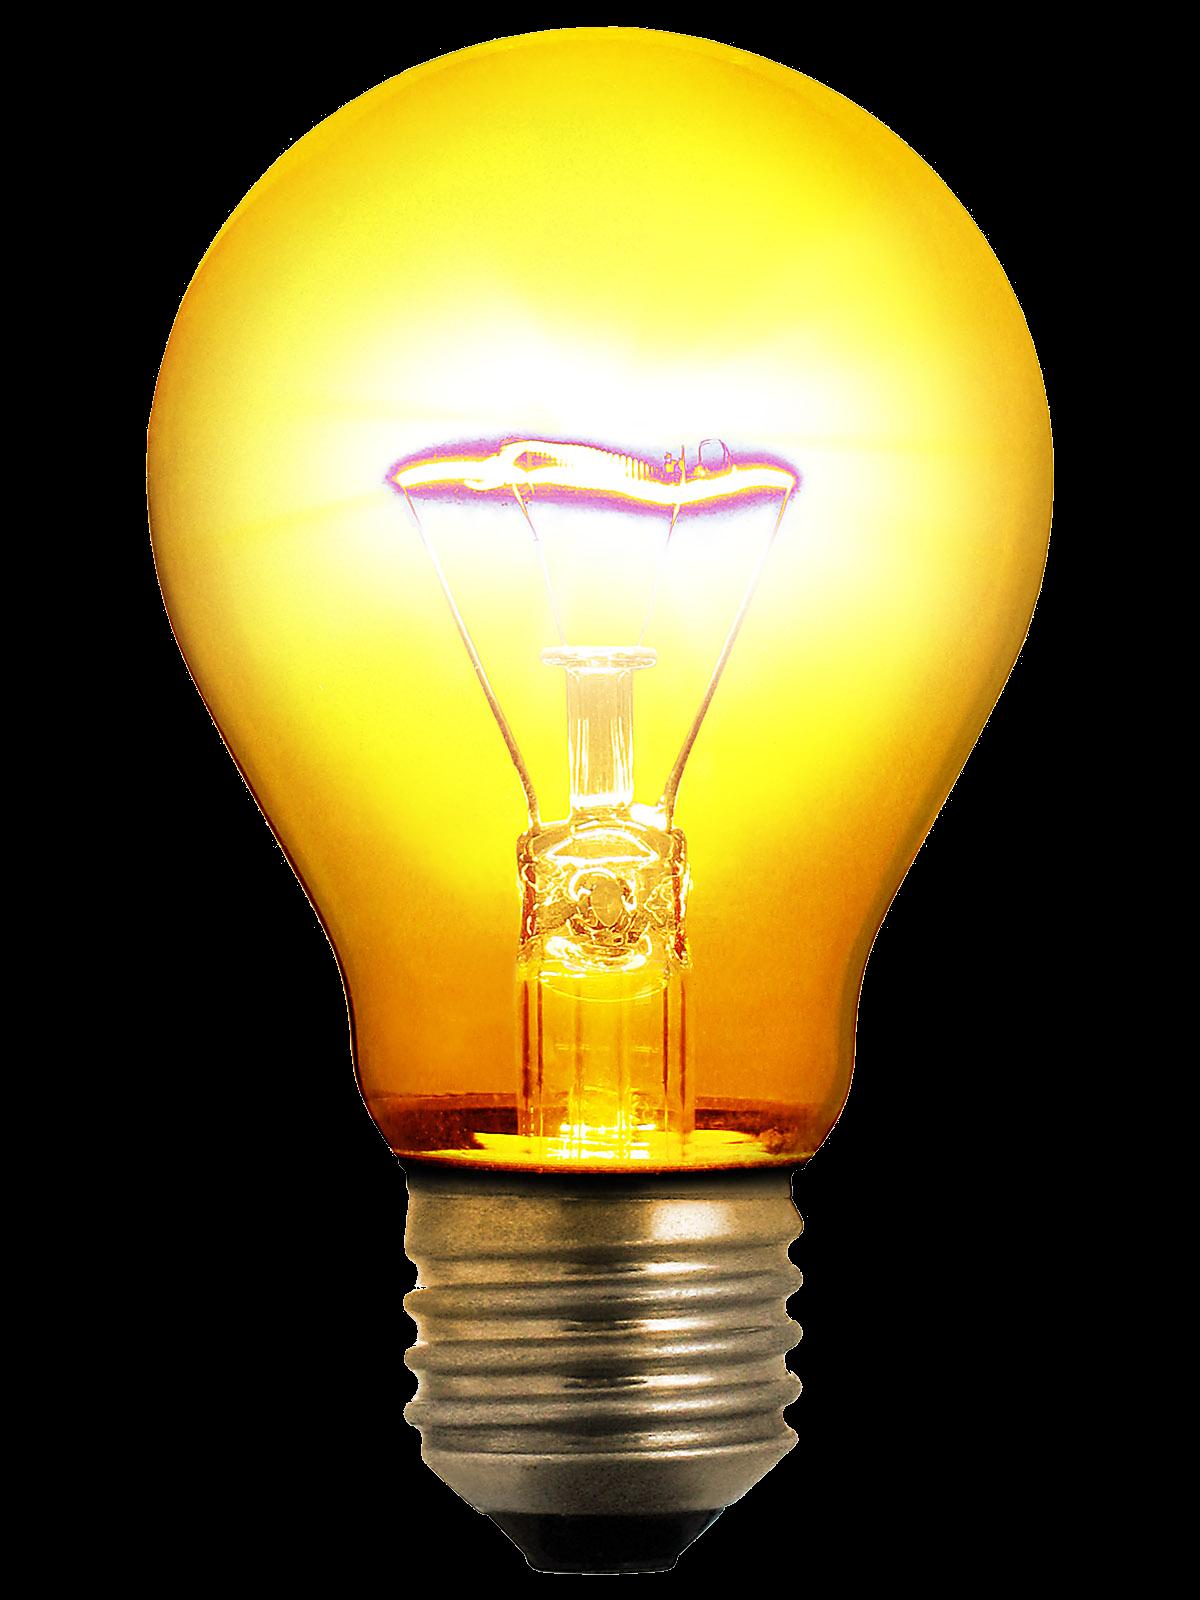 Lightbulb clipart light fixture. Bulb png transparent free